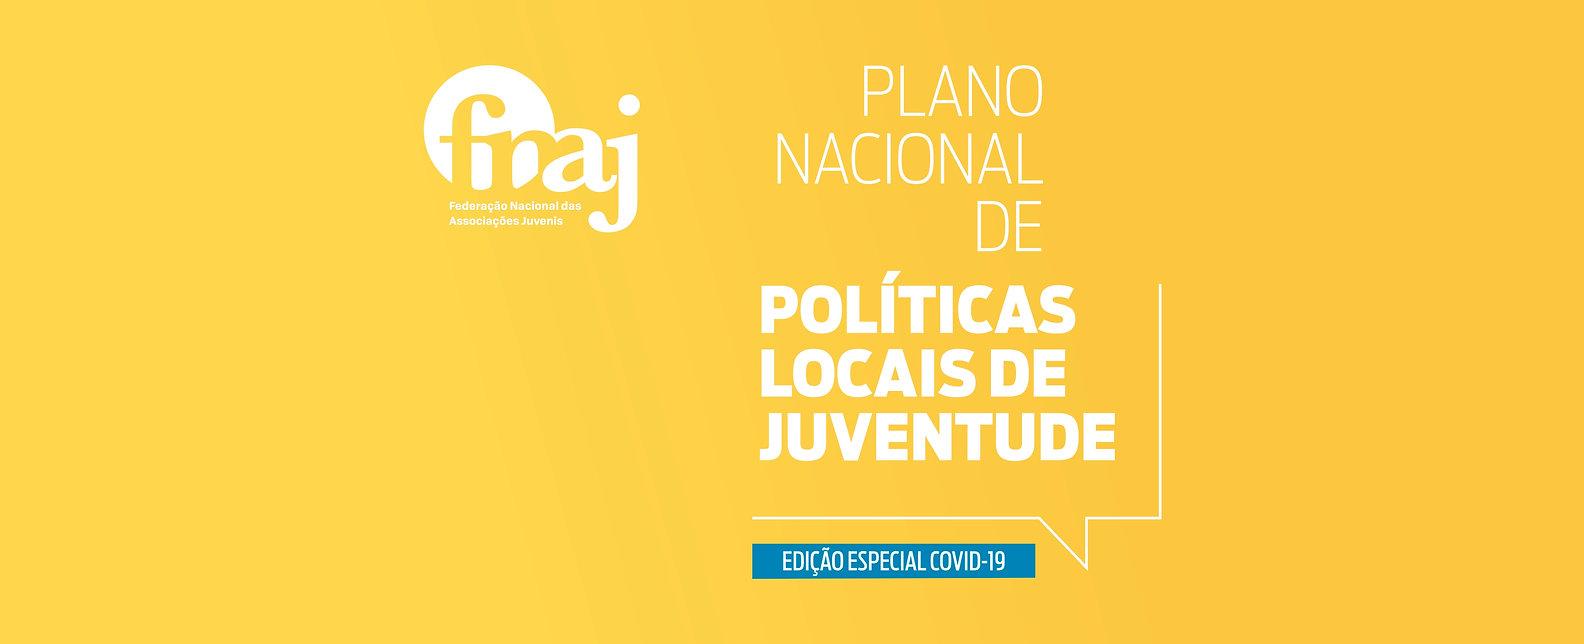 Plano_nacional_Covid.jpg